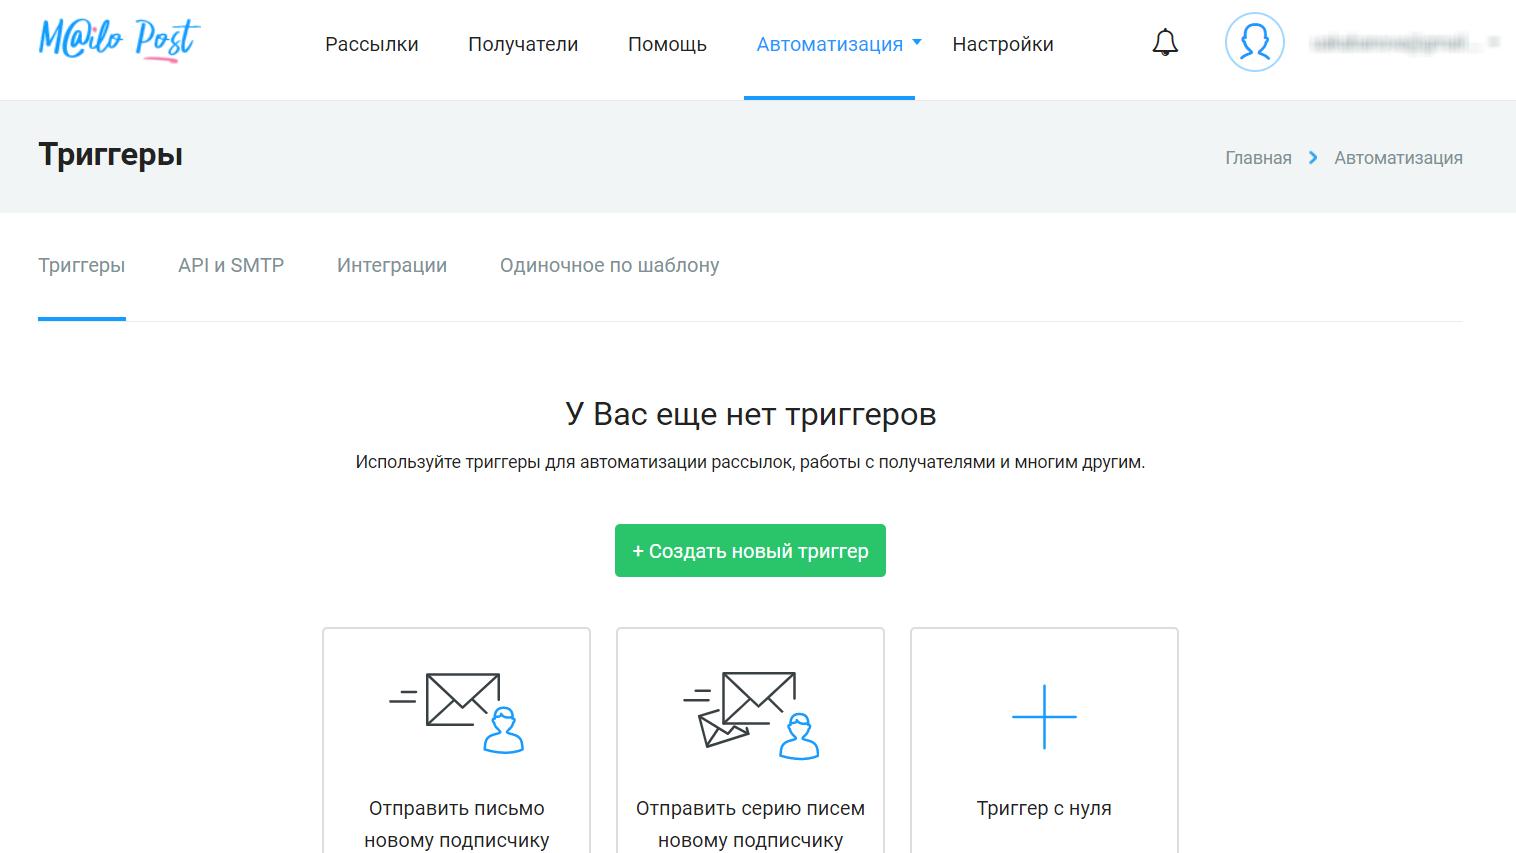 мэйло пост интерфейс